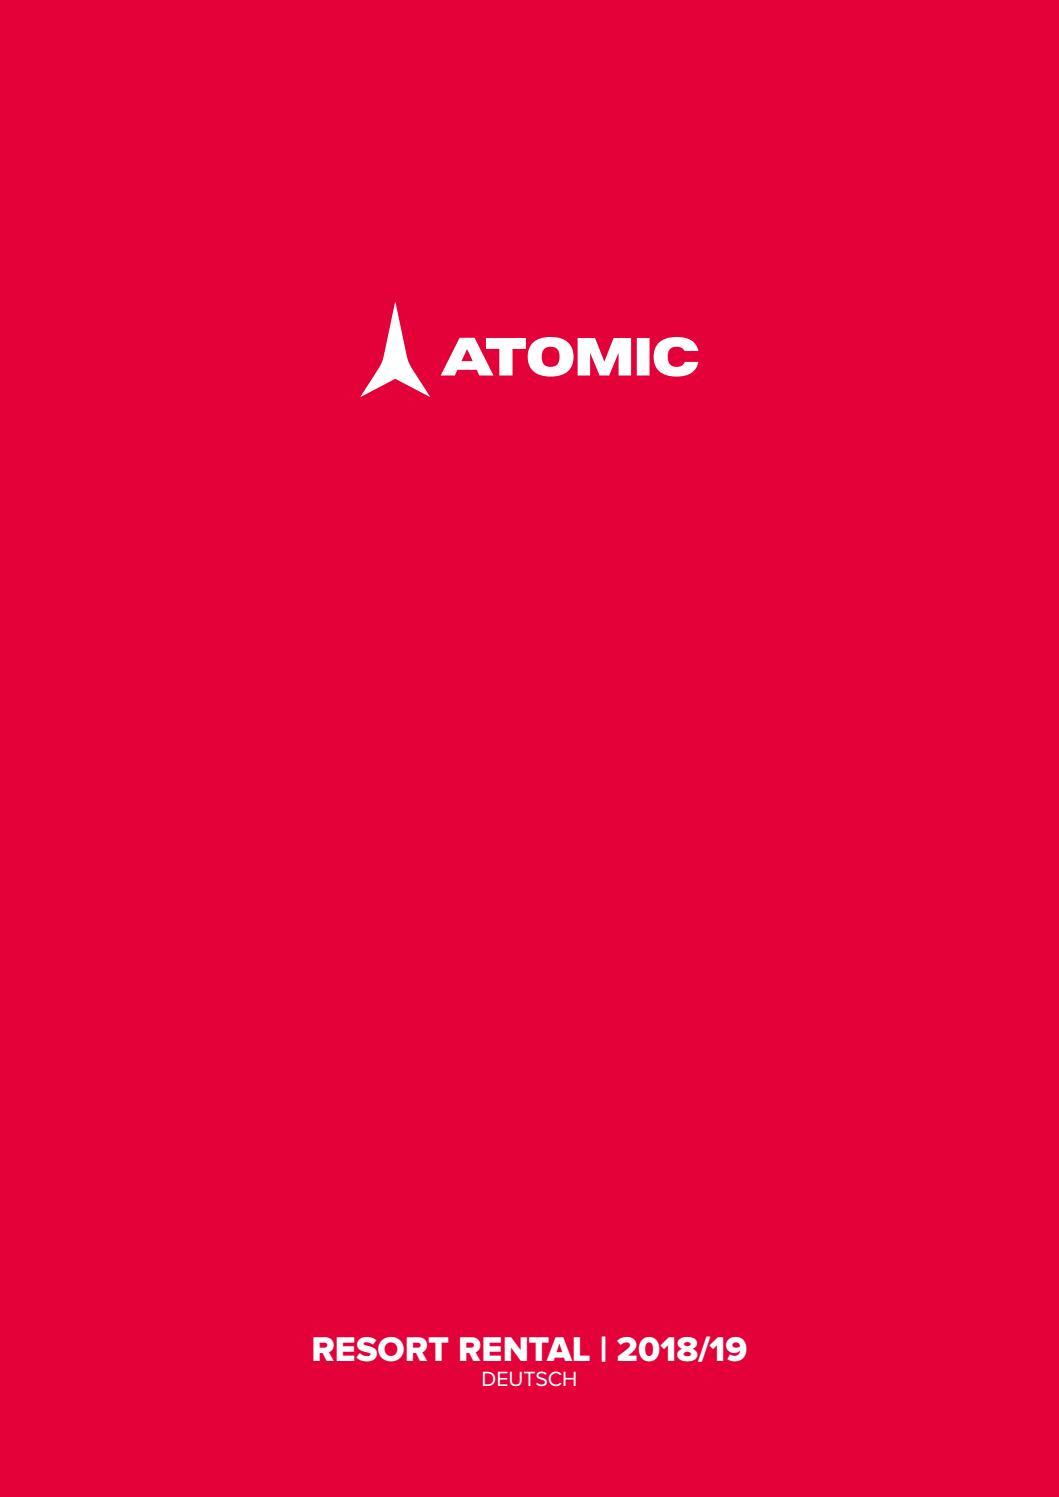 Atomic Resort Rental 201819 by Salomon issuu